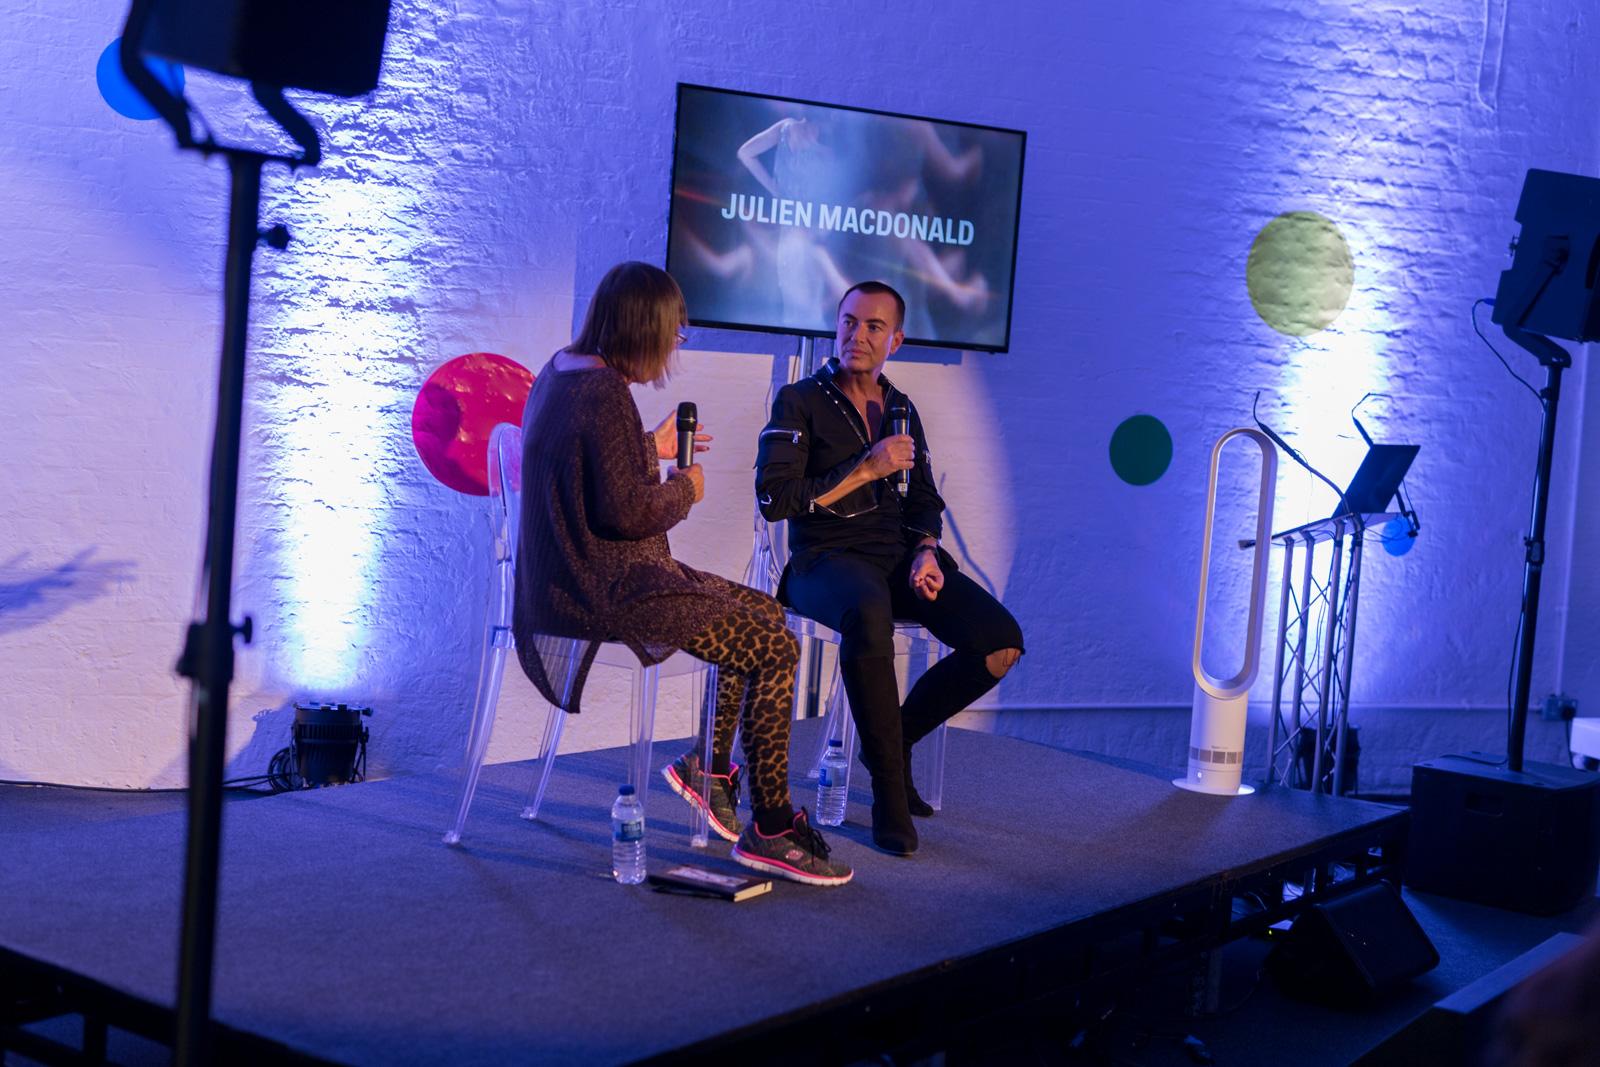 (Julien Macdonald in conversation with Hilary Alexander OBE The career of the King of Glamour by Debenhams) (Debenhams)  (06-06-2017) (image by Qavi Reyez)_-4.jpg